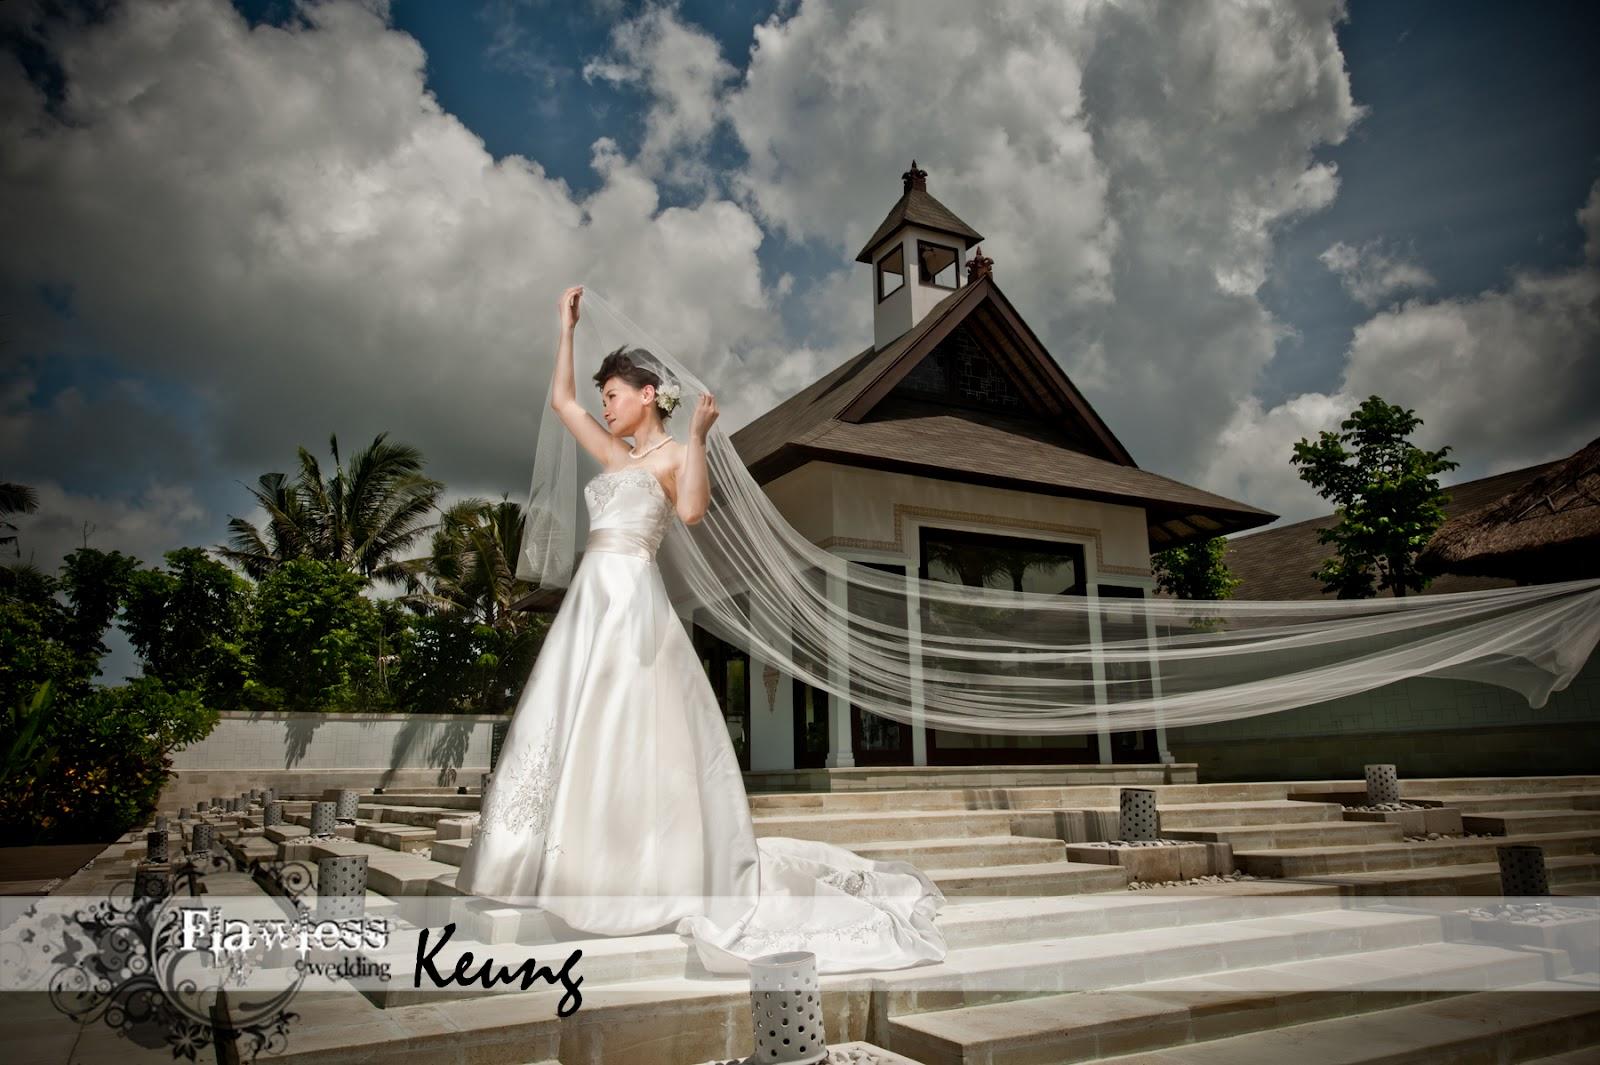 Flawless Wedding HK Blog: PreWedding@Bali